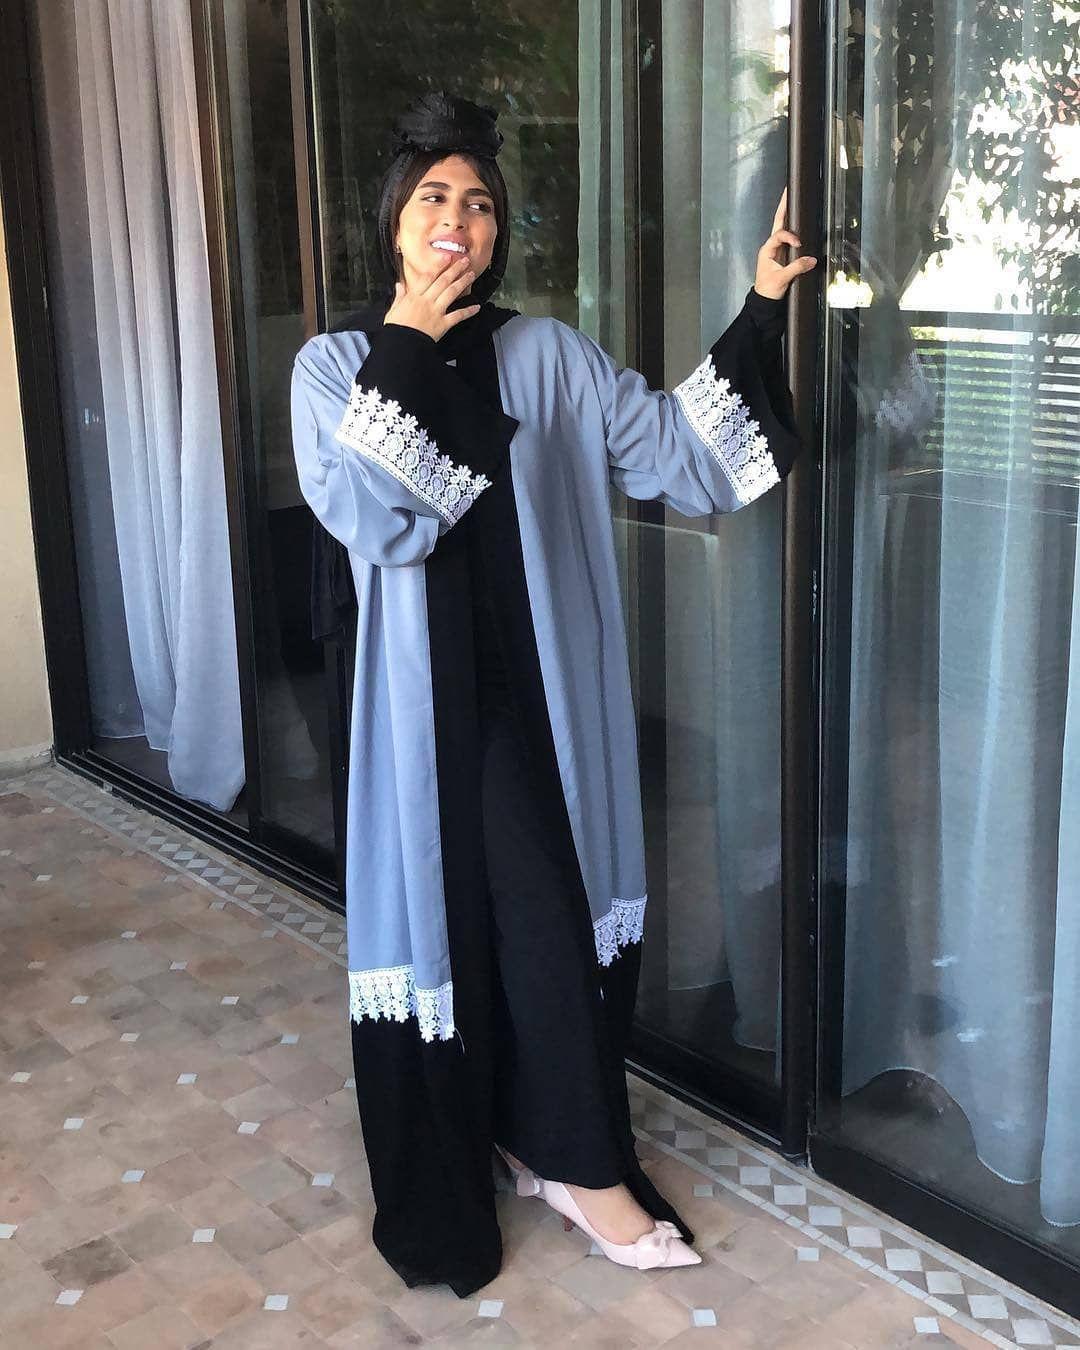 162 Mentions J Aime 4 Commentaires Amina Karam أمـينة كـرم Amiinakaramkanz Sur Instagram Fashion Women S Top Kimono Top